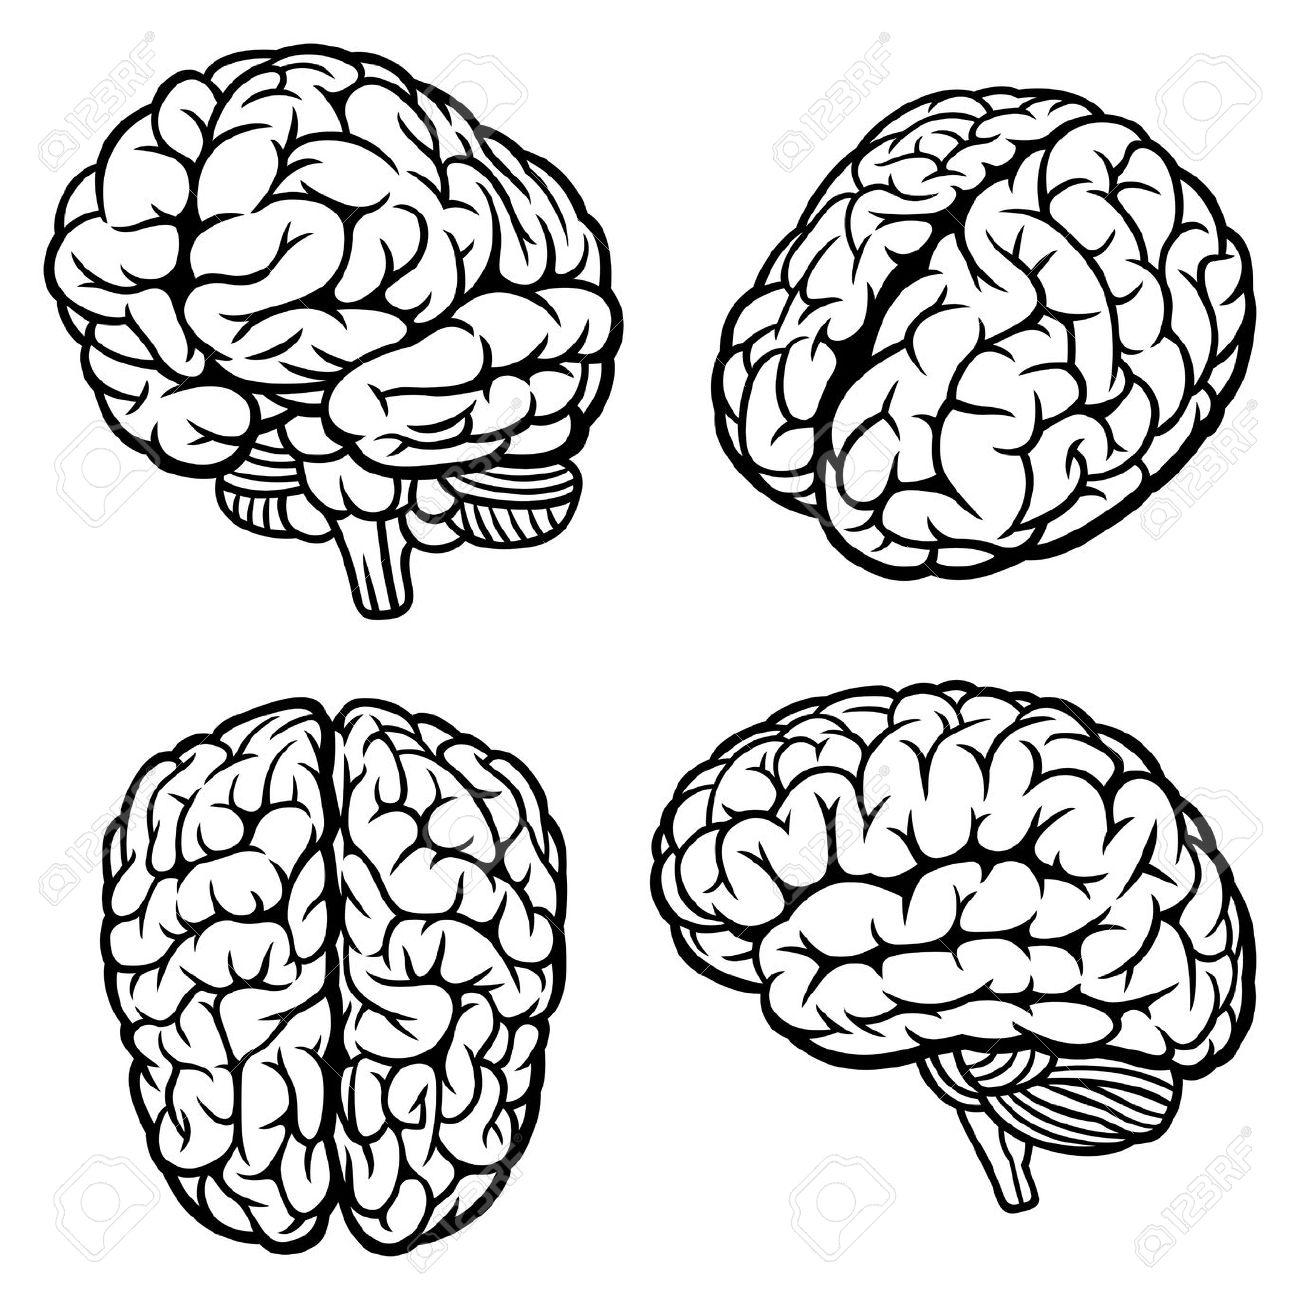 Drawn brain Drawing/coloring/fashion Brain of four anatomy